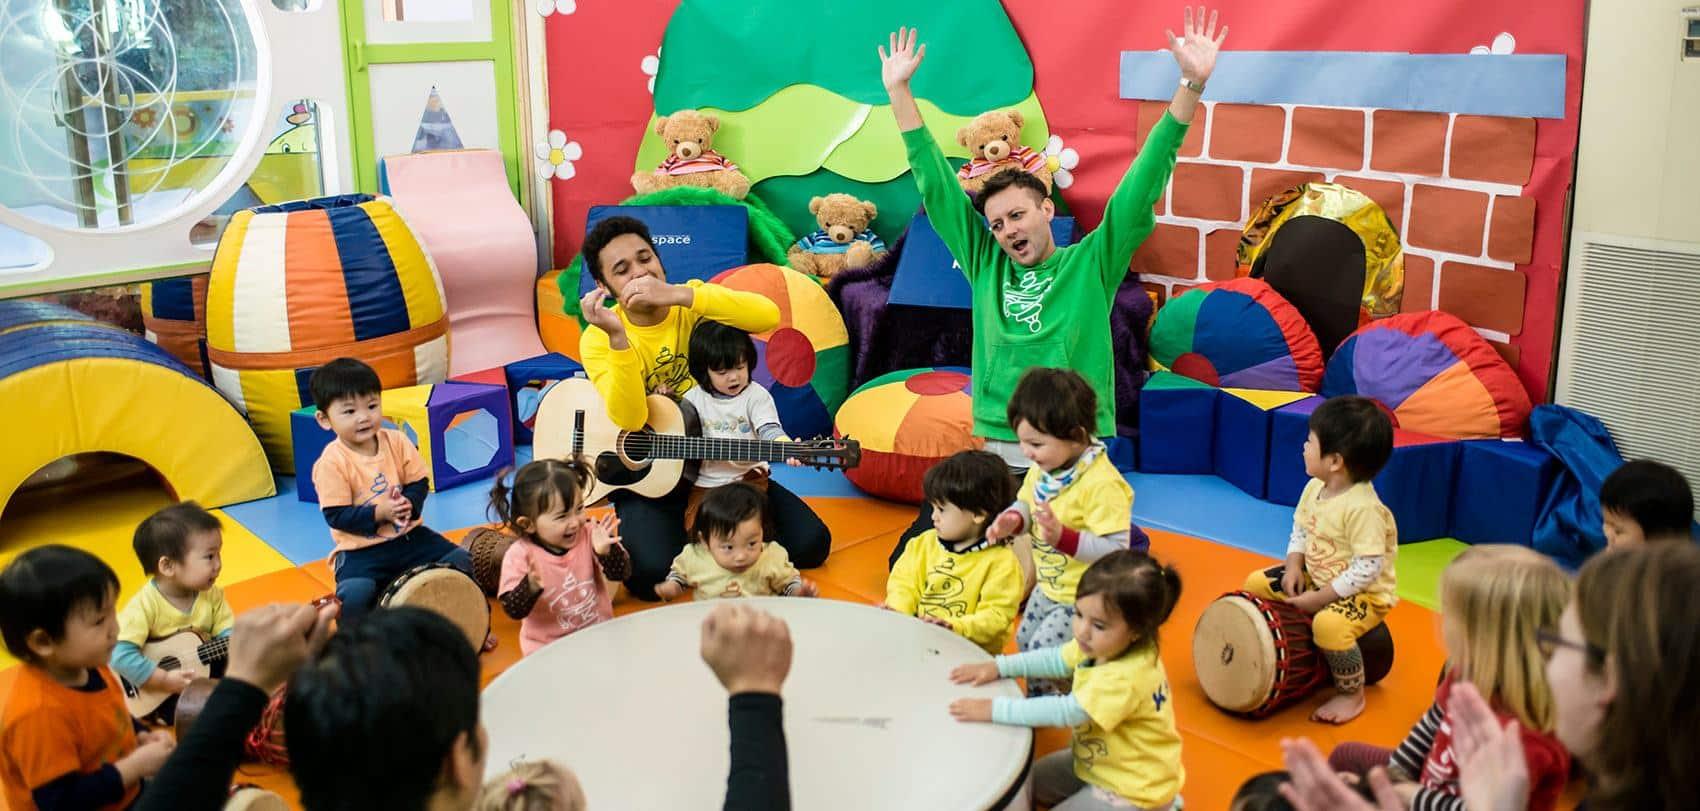 Kspace International Preschool & Kindergarten Shirokanedai, Tokyo